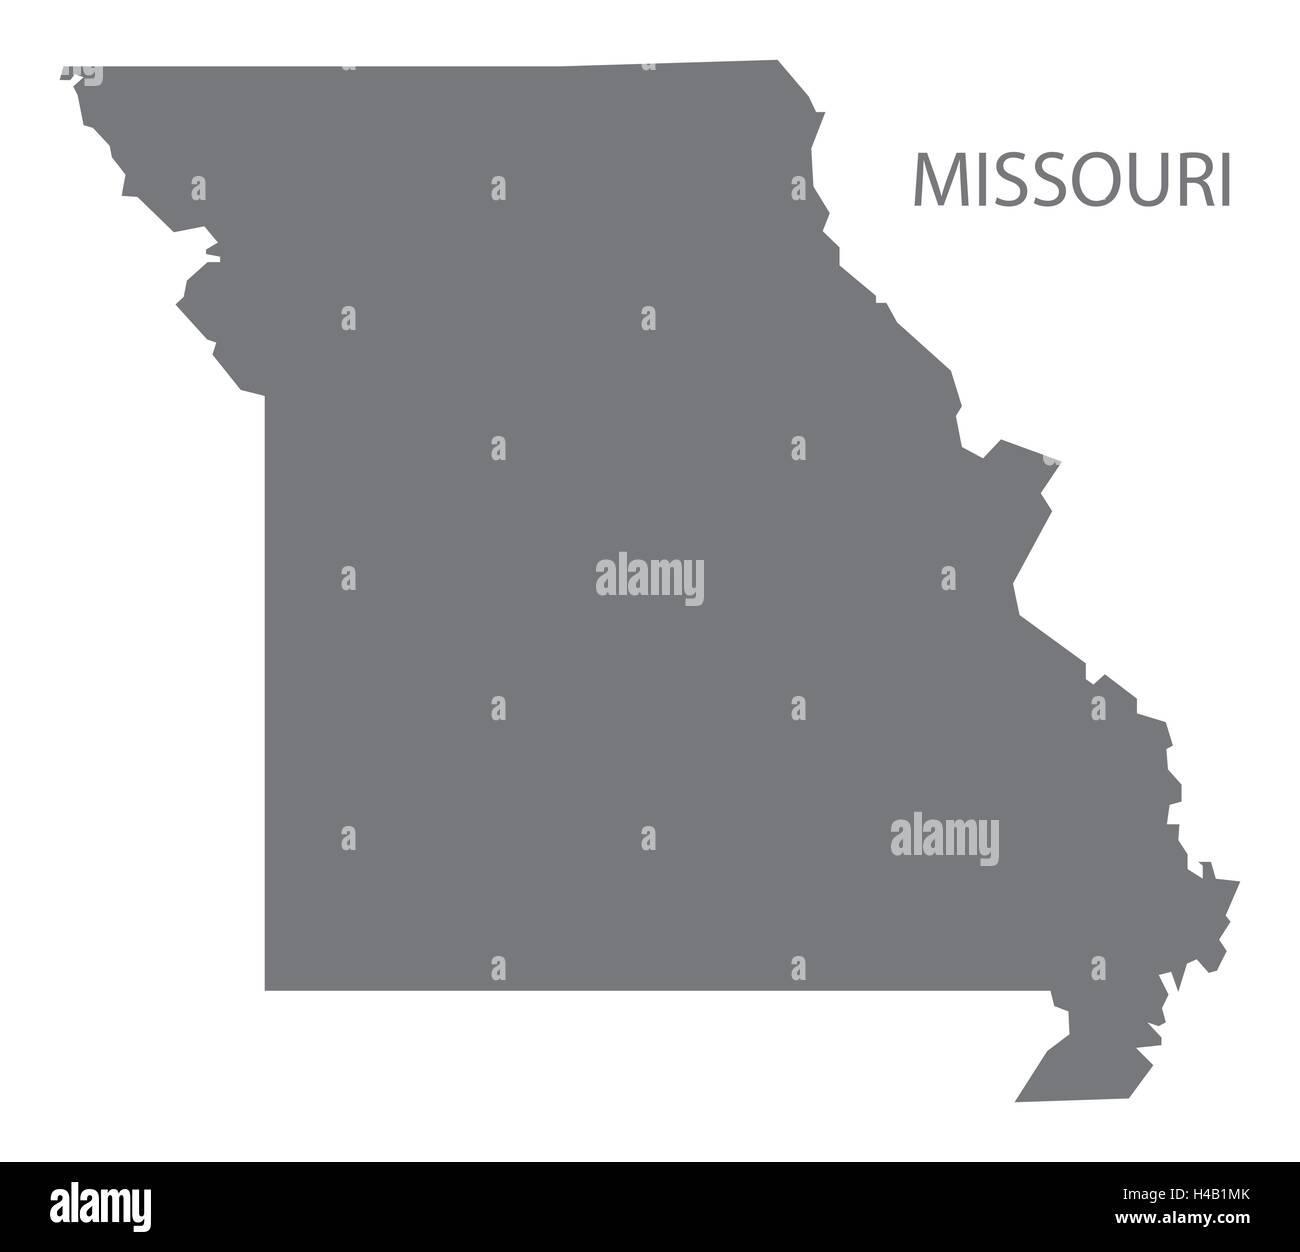 Usa Map Highlighting State Of Missouri Vector Stock Vector Art - Missouri usa map